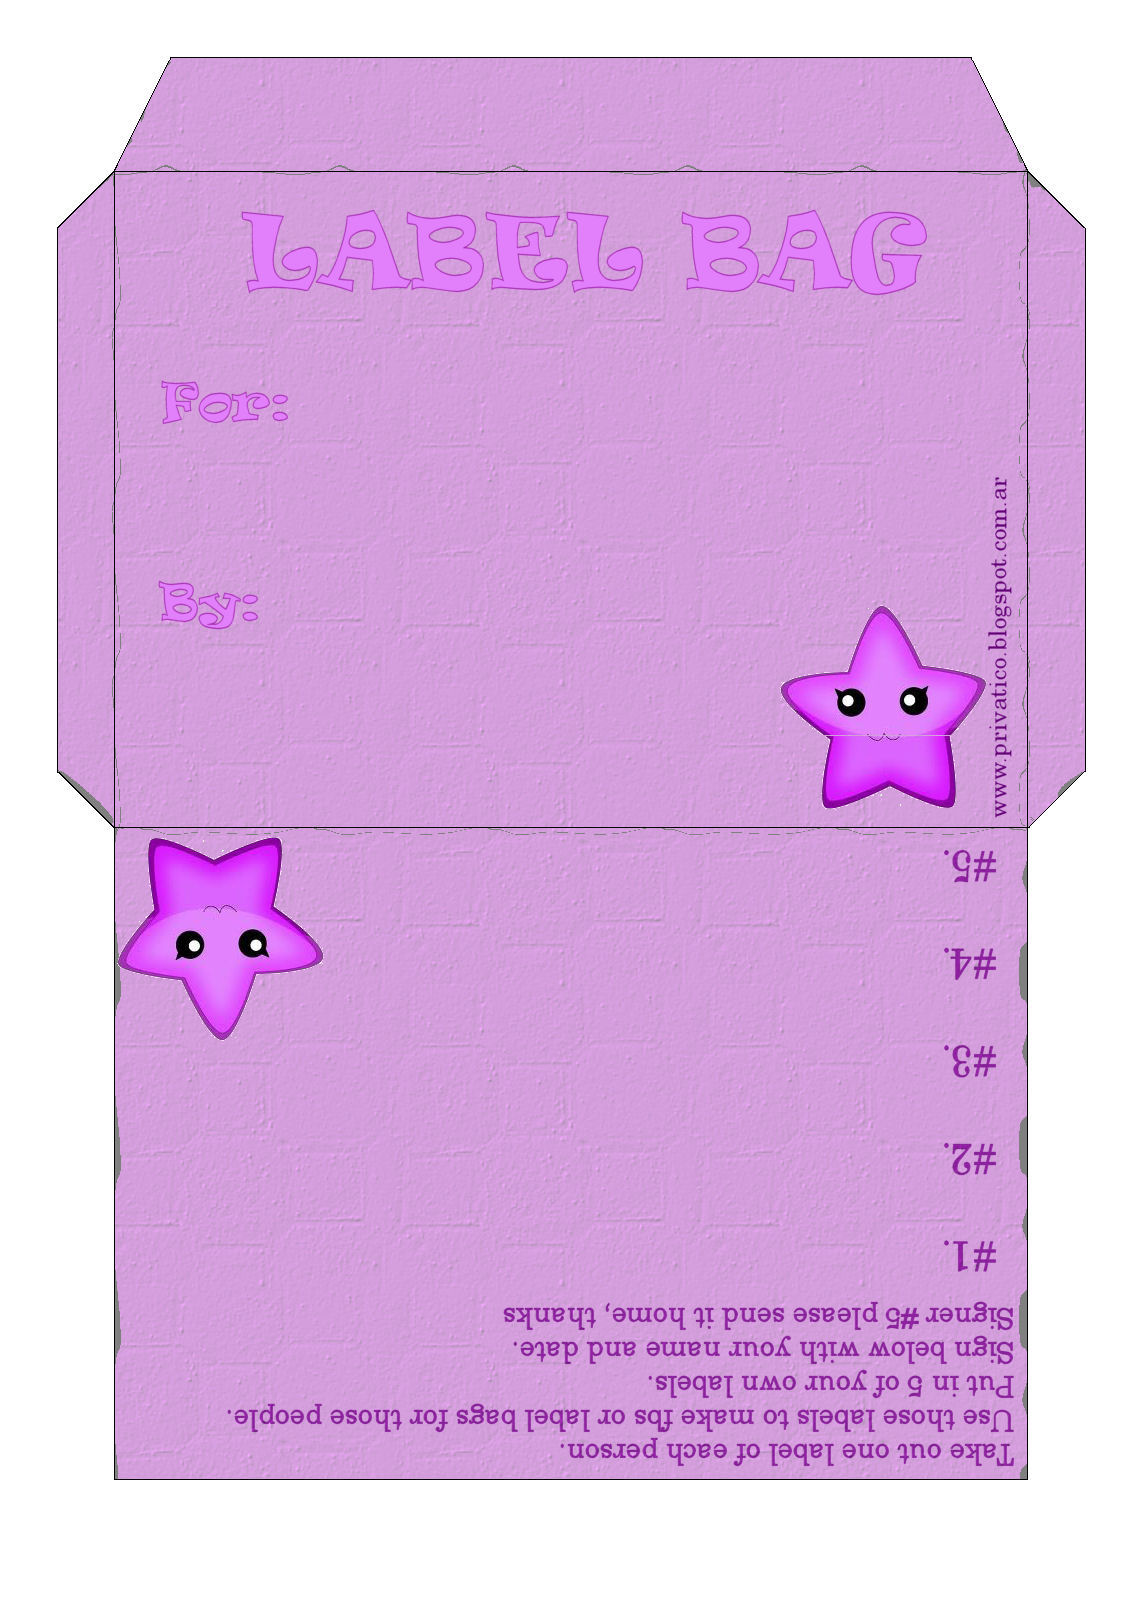 El Atico: Label Bags para imprimir